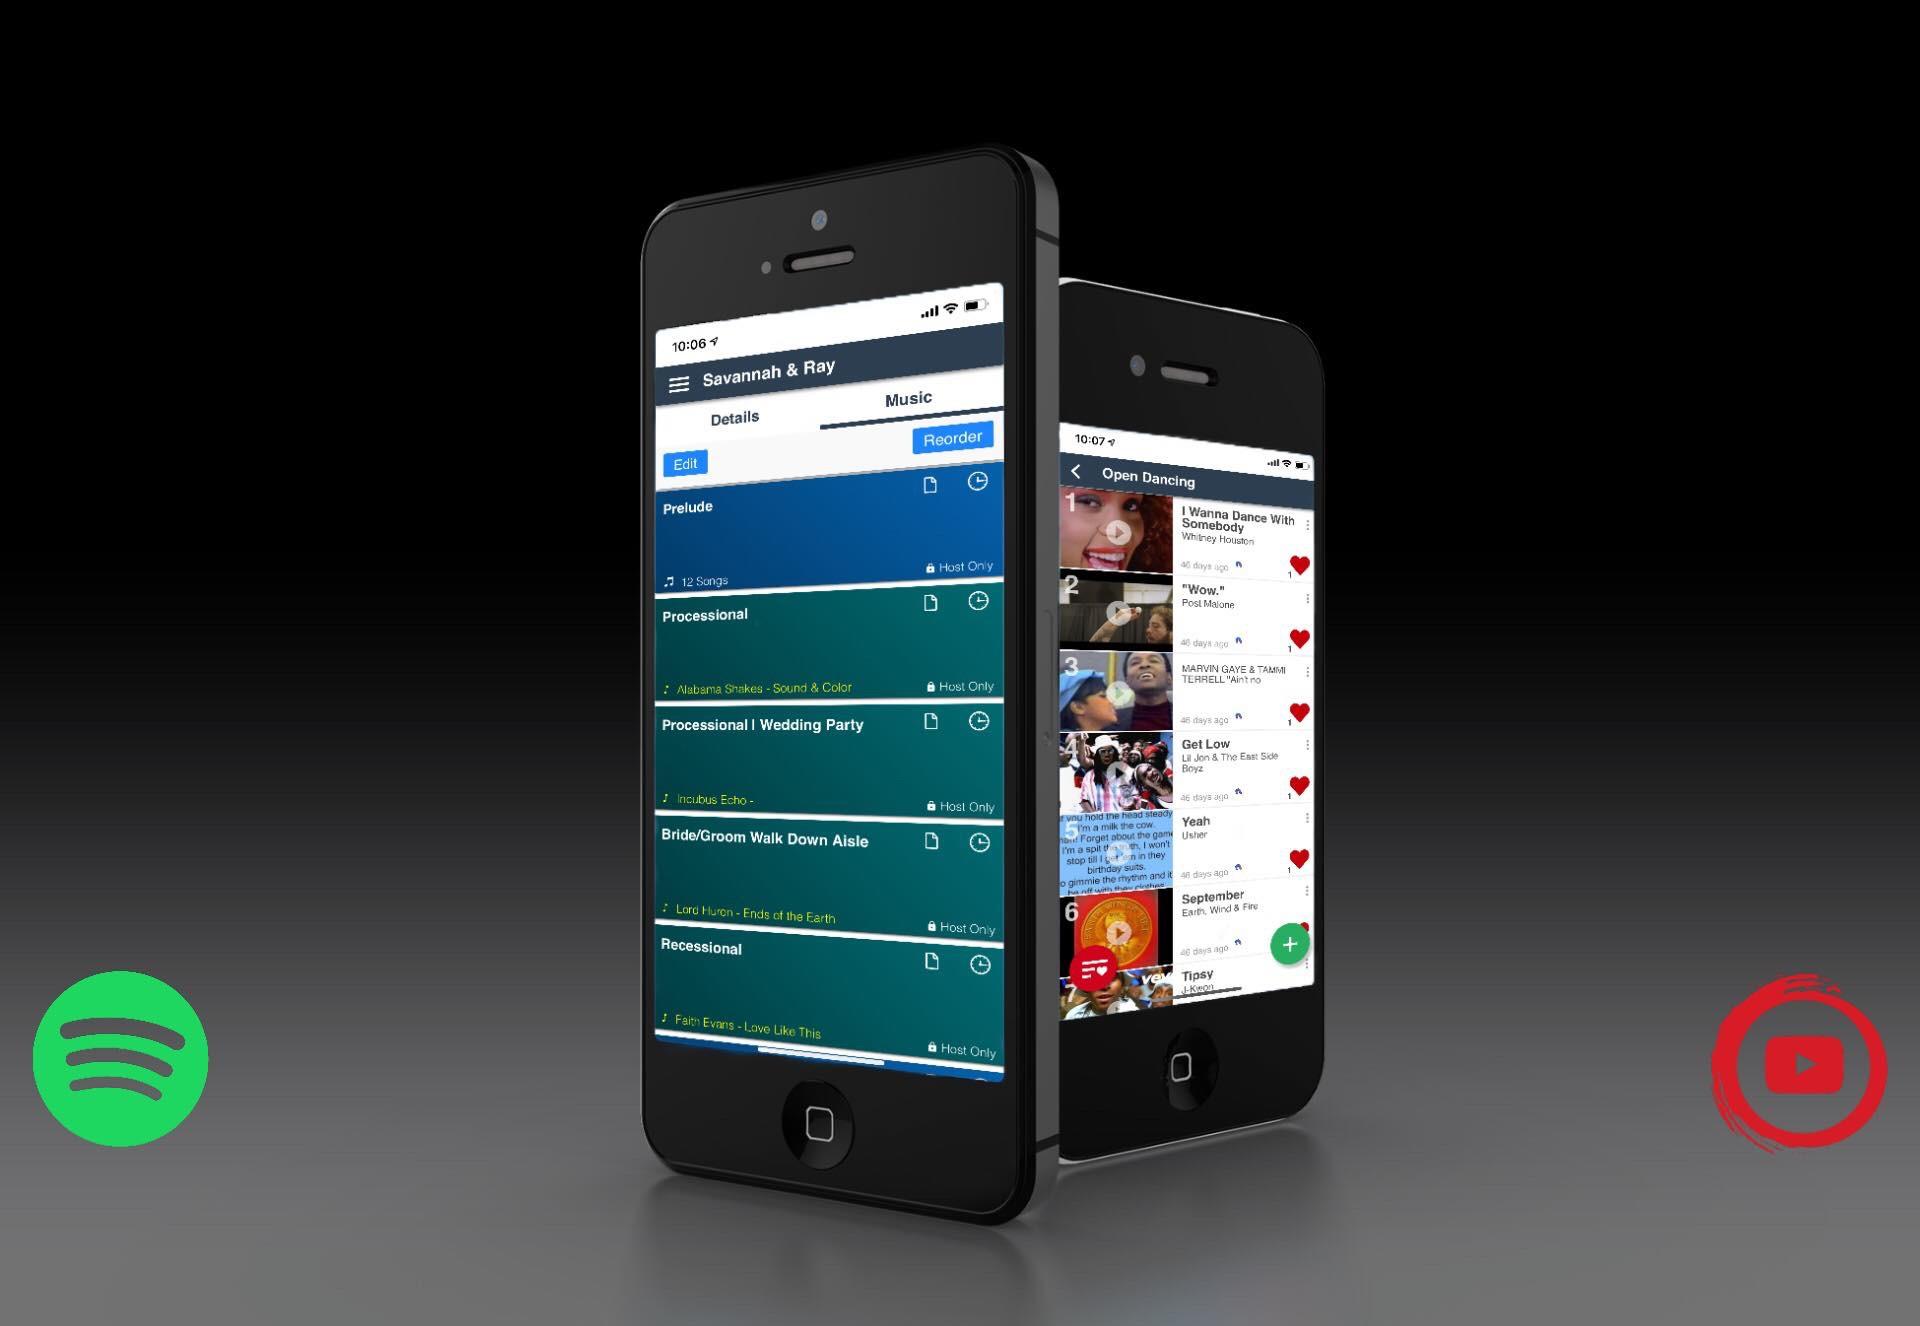 vibo phones black.JPG